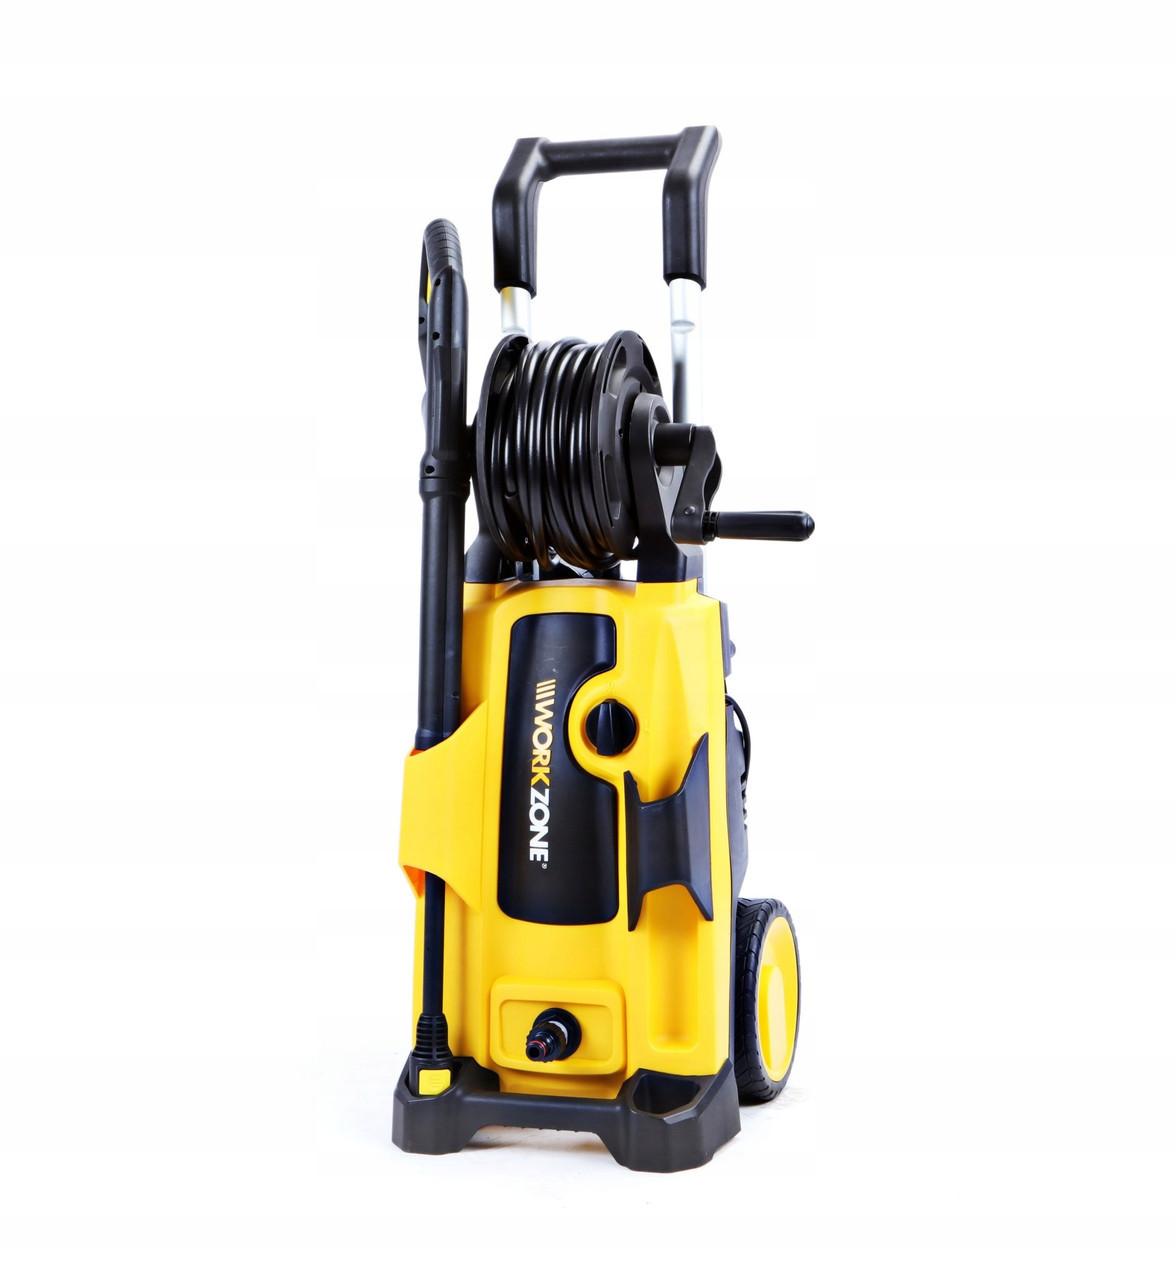 Мойка высокого давления WorkZone (Karcher K5) 150 Bar 2200w